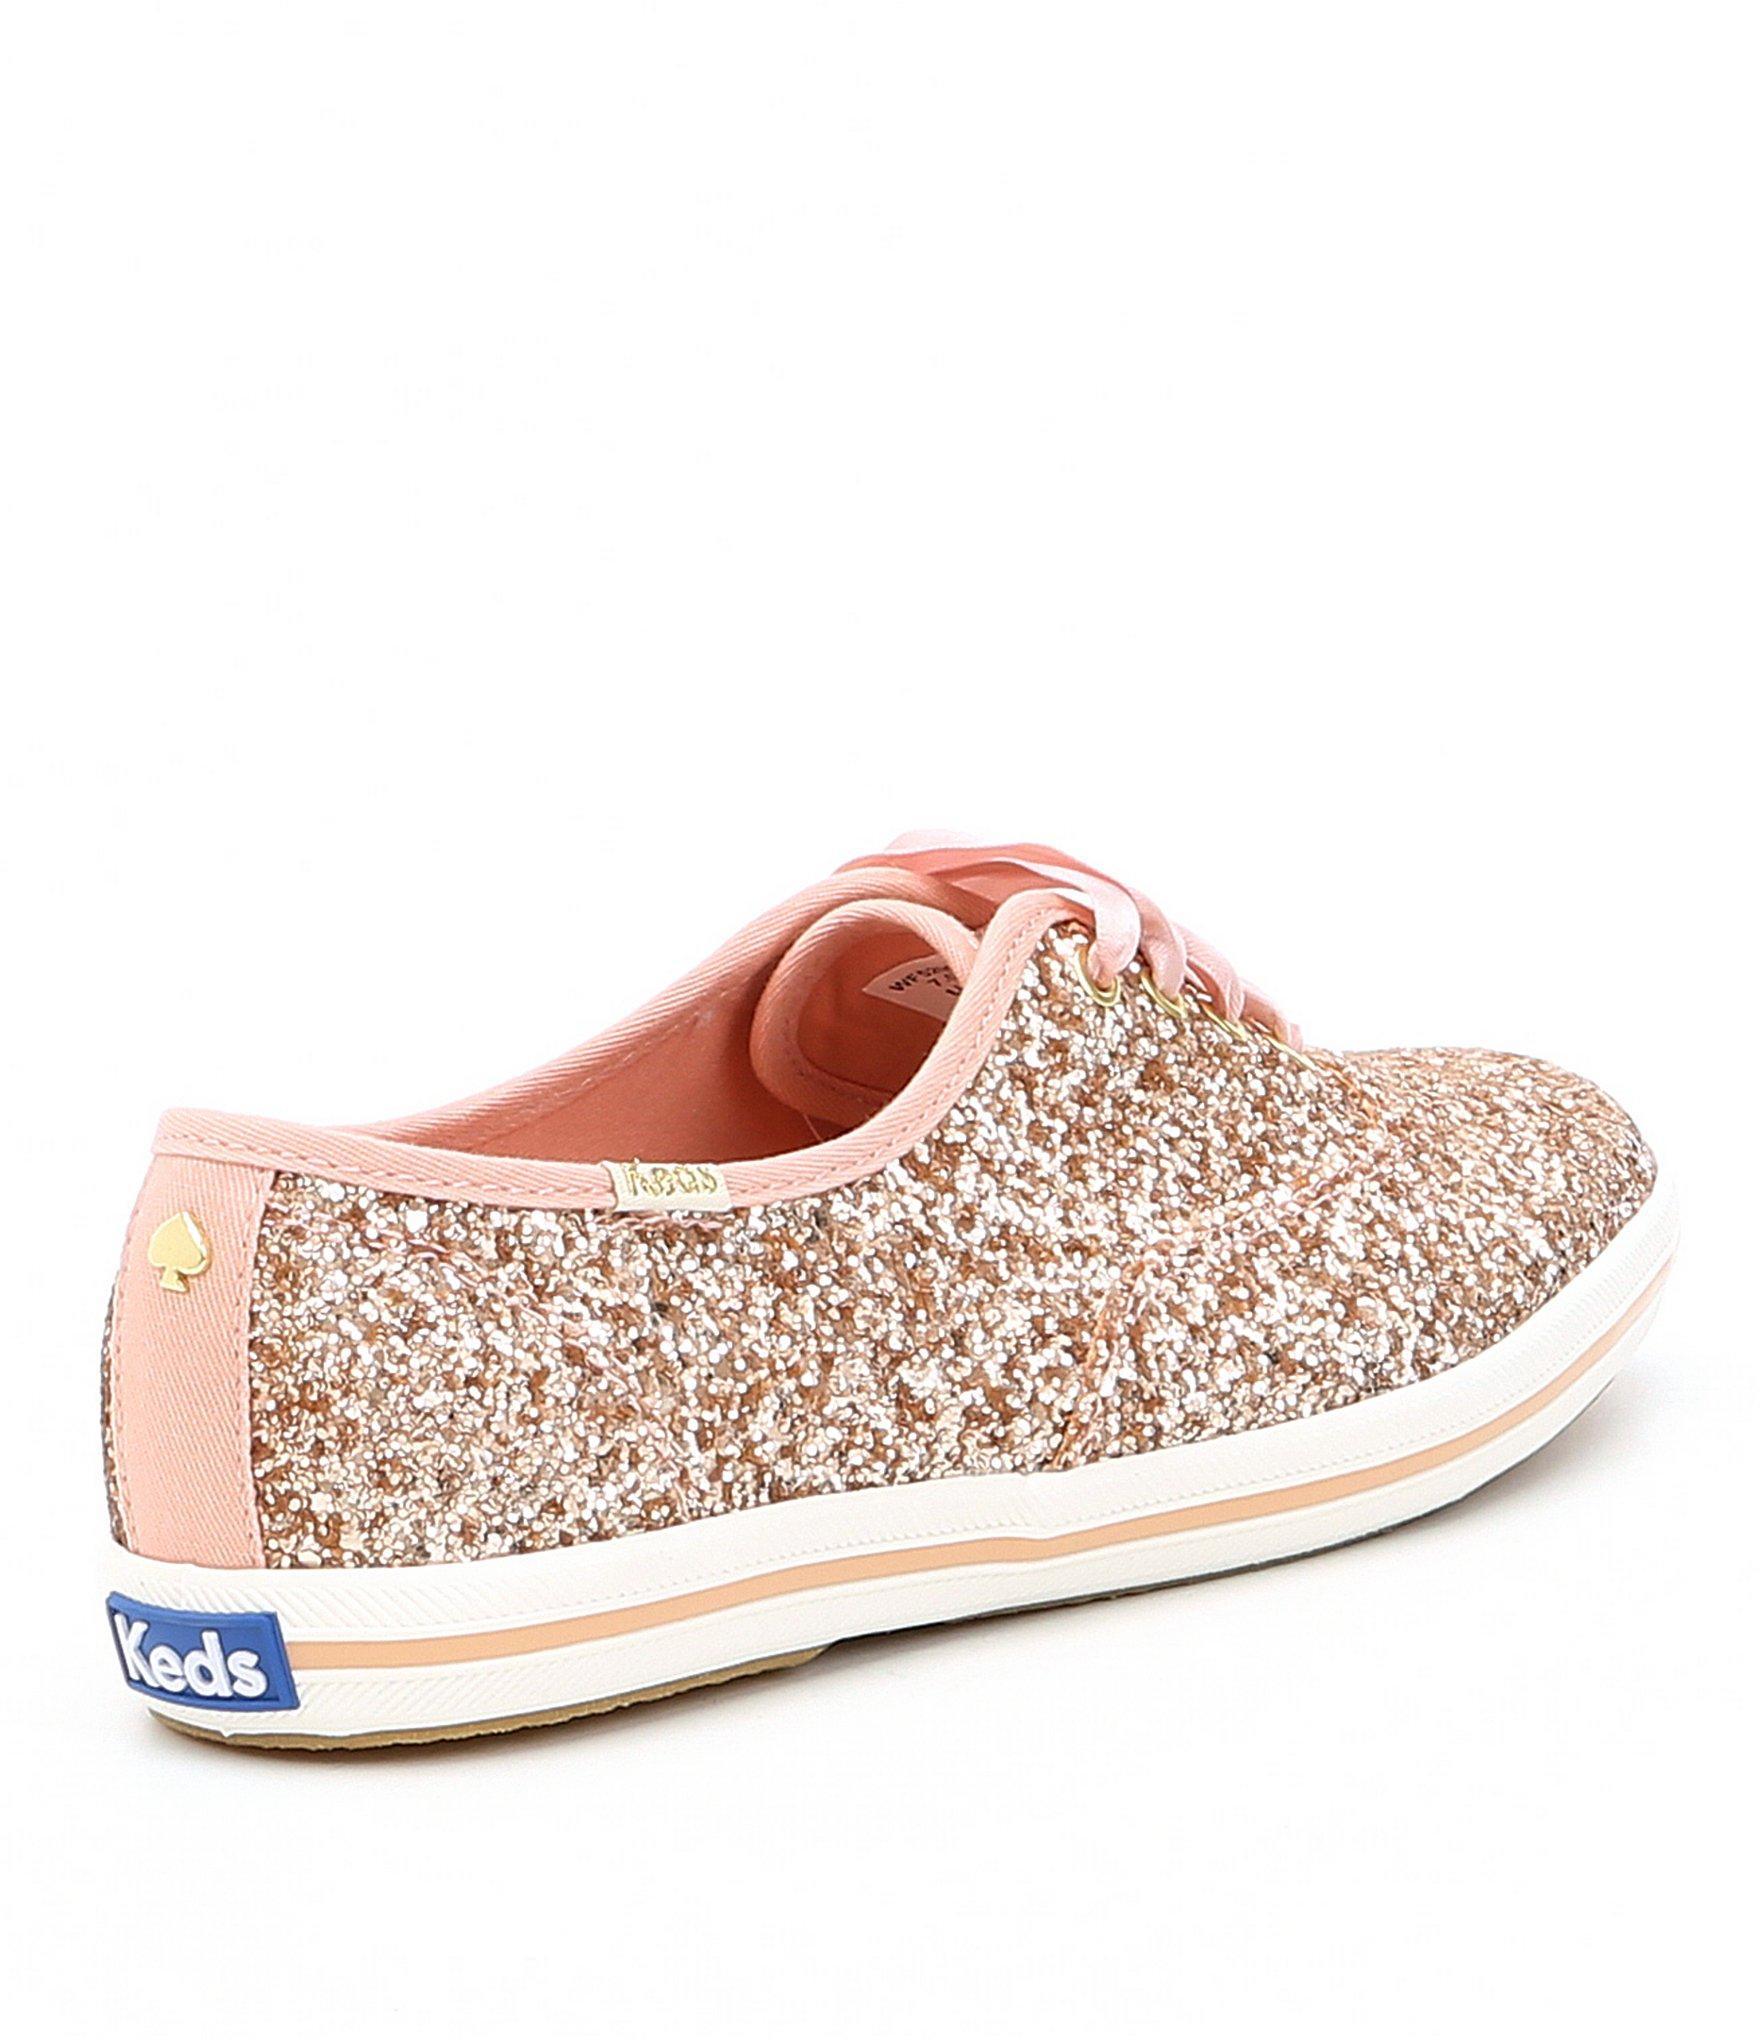 5bd63803fae1 Kate Spade - Metallic Keds X Glitter Keds Sneakers - Lyst. View fullscreen